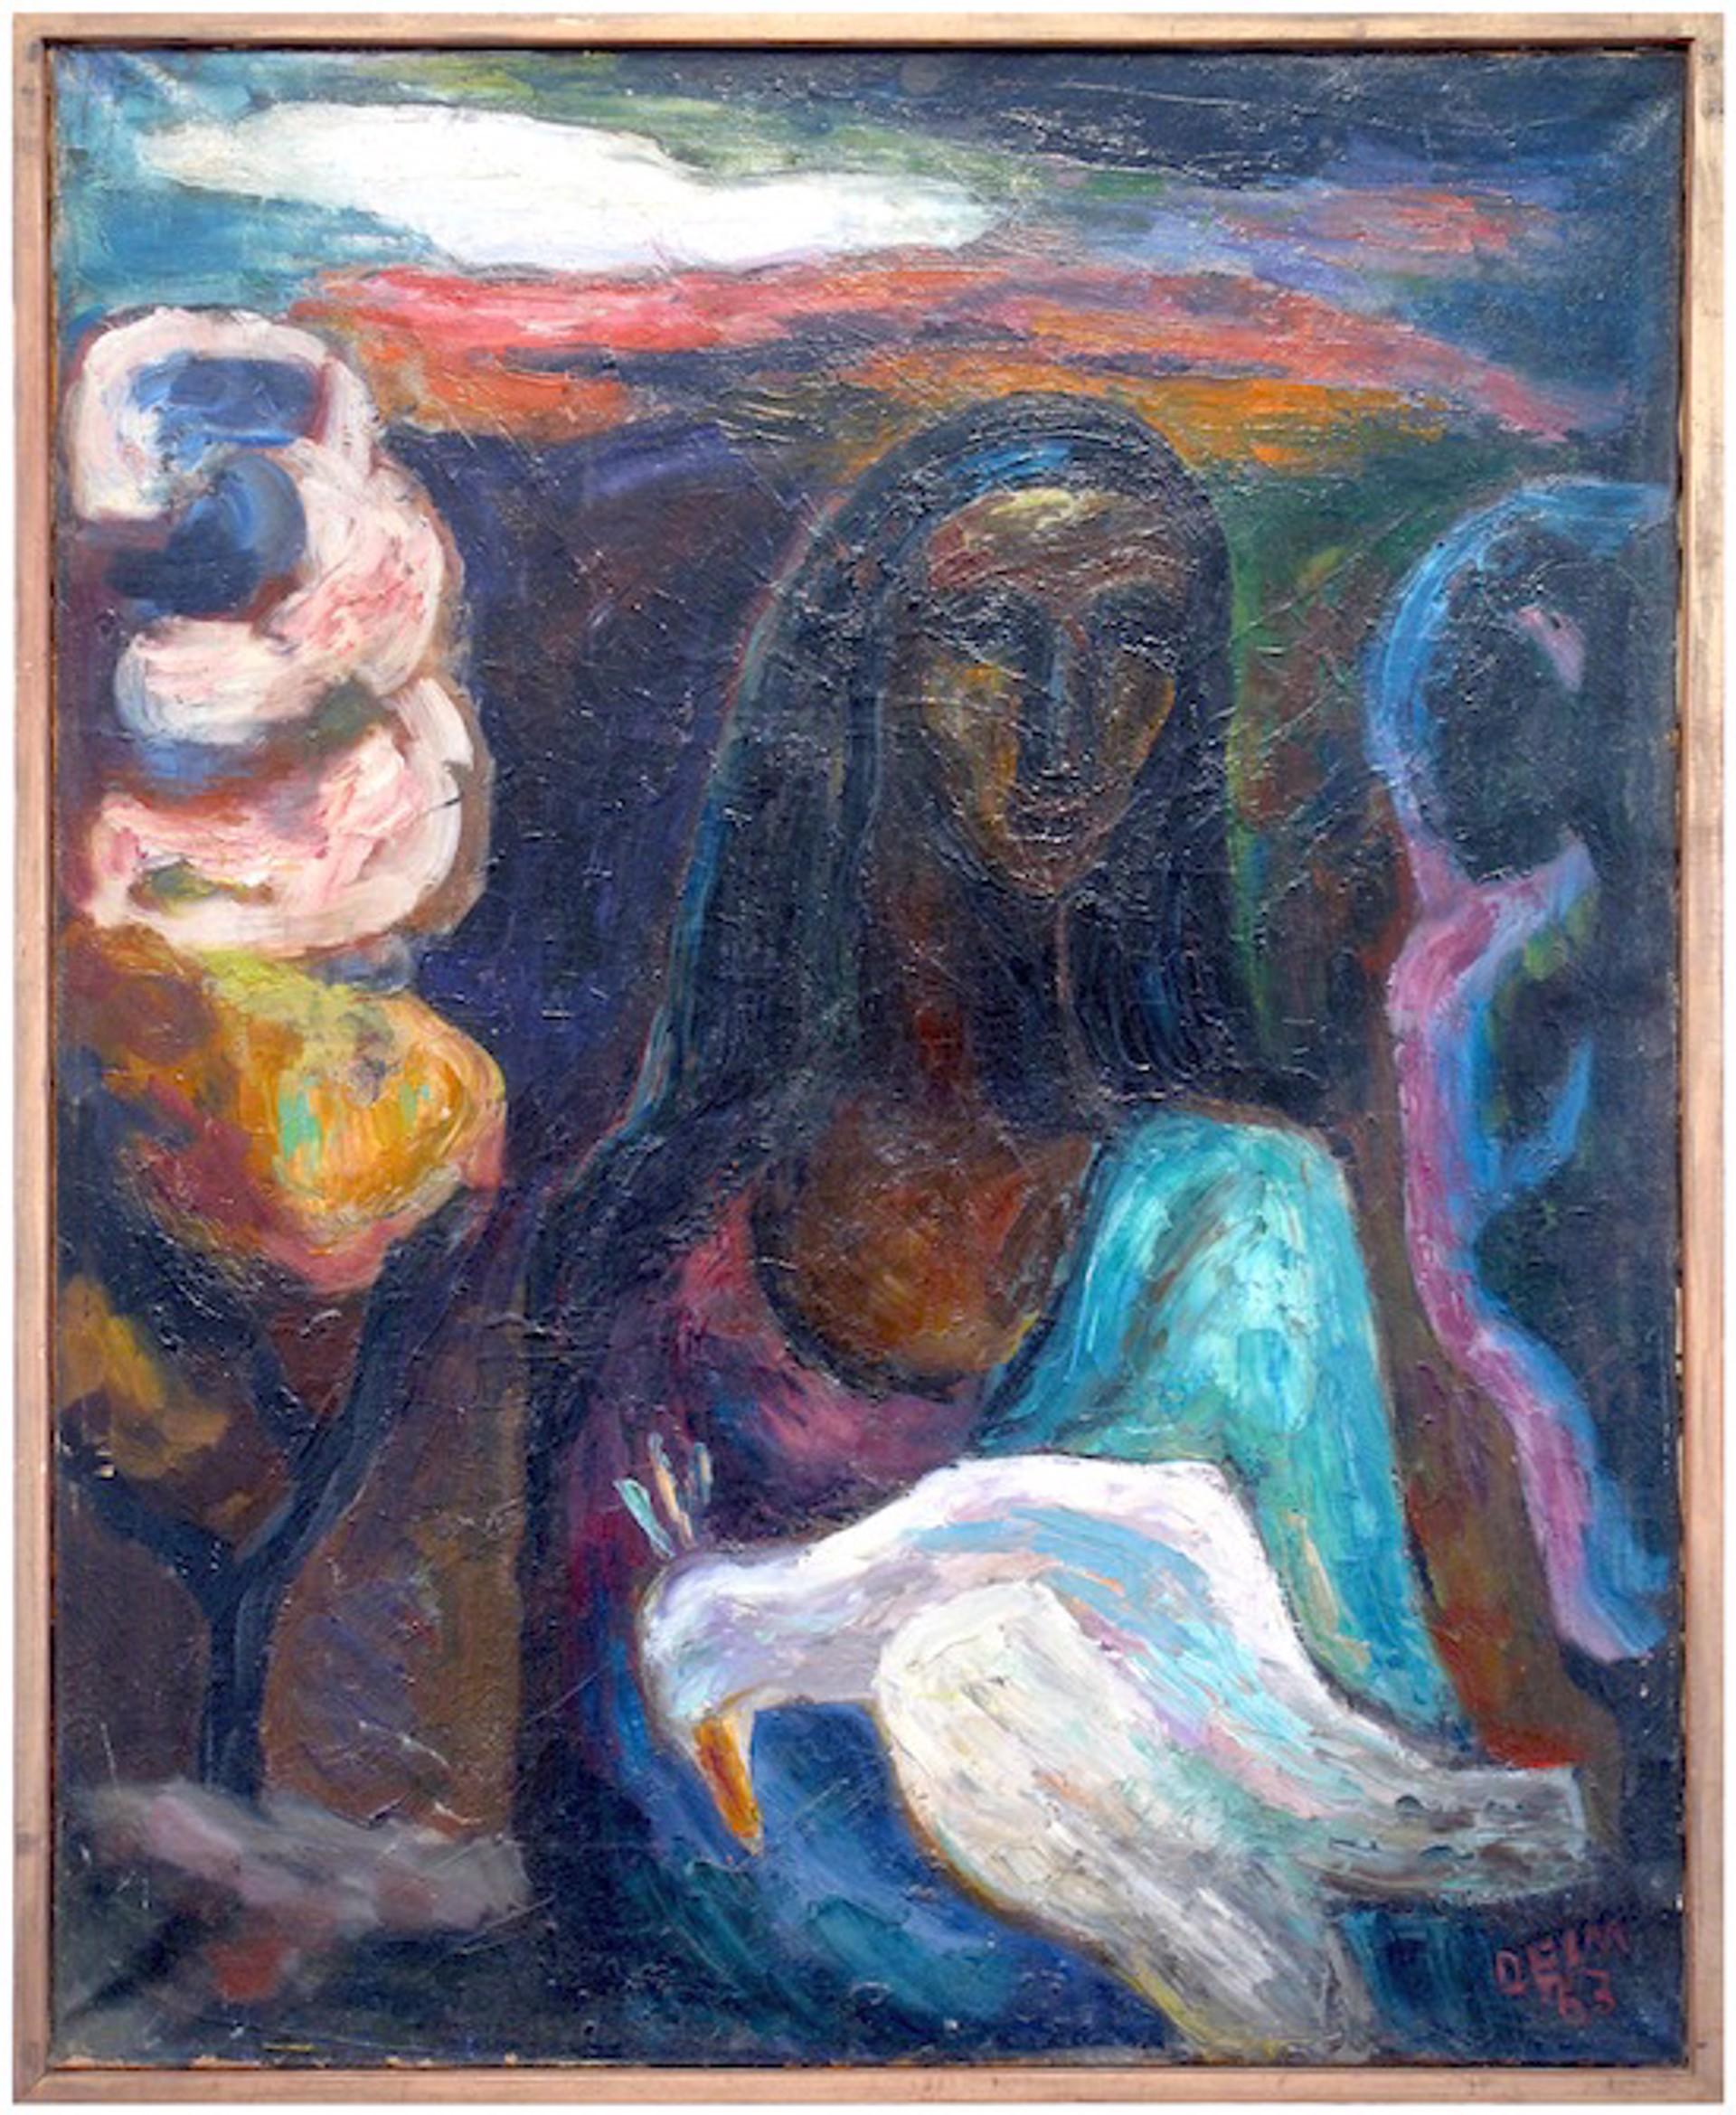 Gitane Avec L'oiseau Blesse by Judith Deim